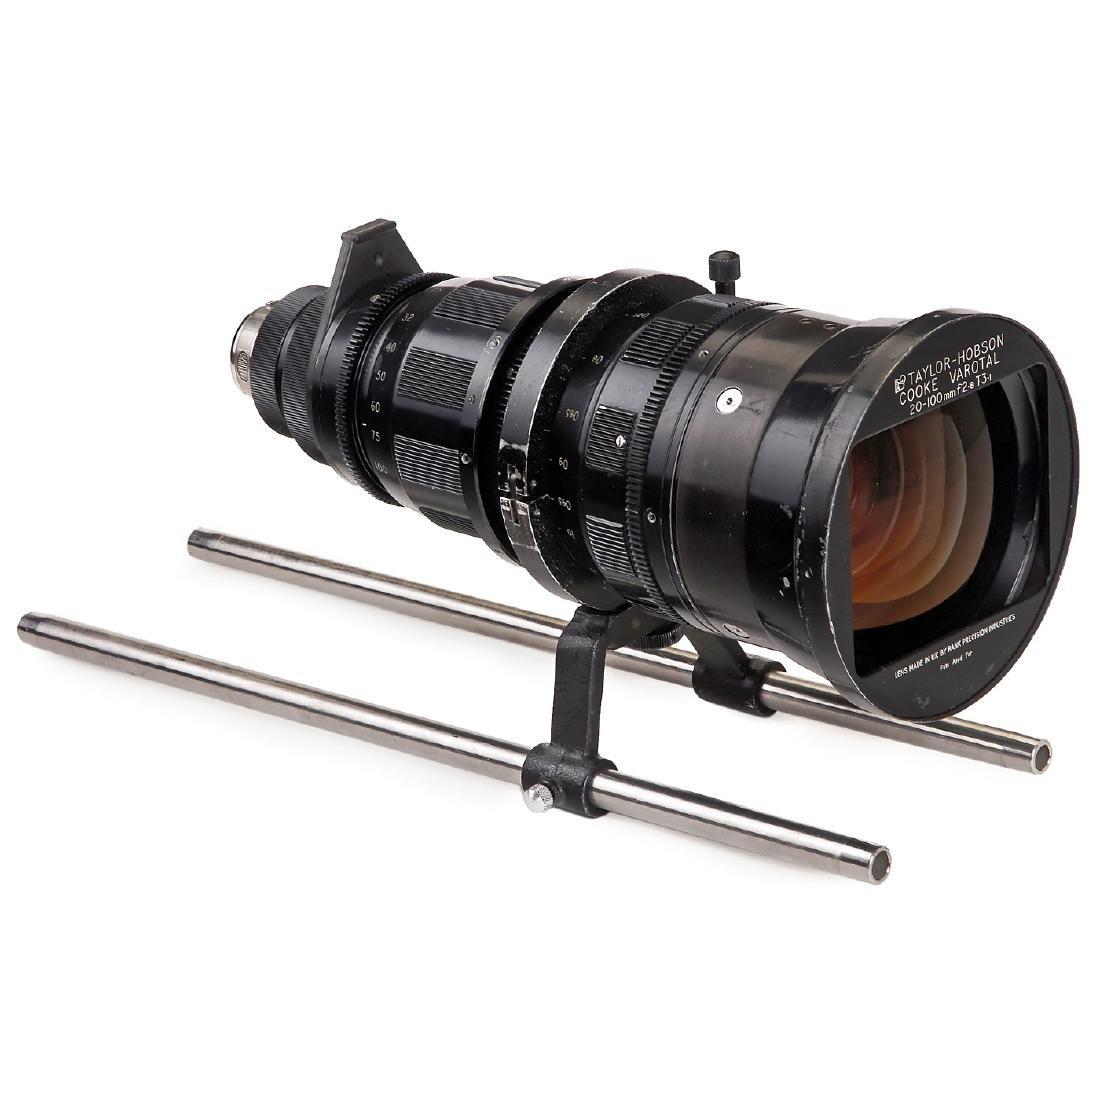 Cooke-Varotal Zoom 1:2,8/20-100 mm Lens, c. 1965